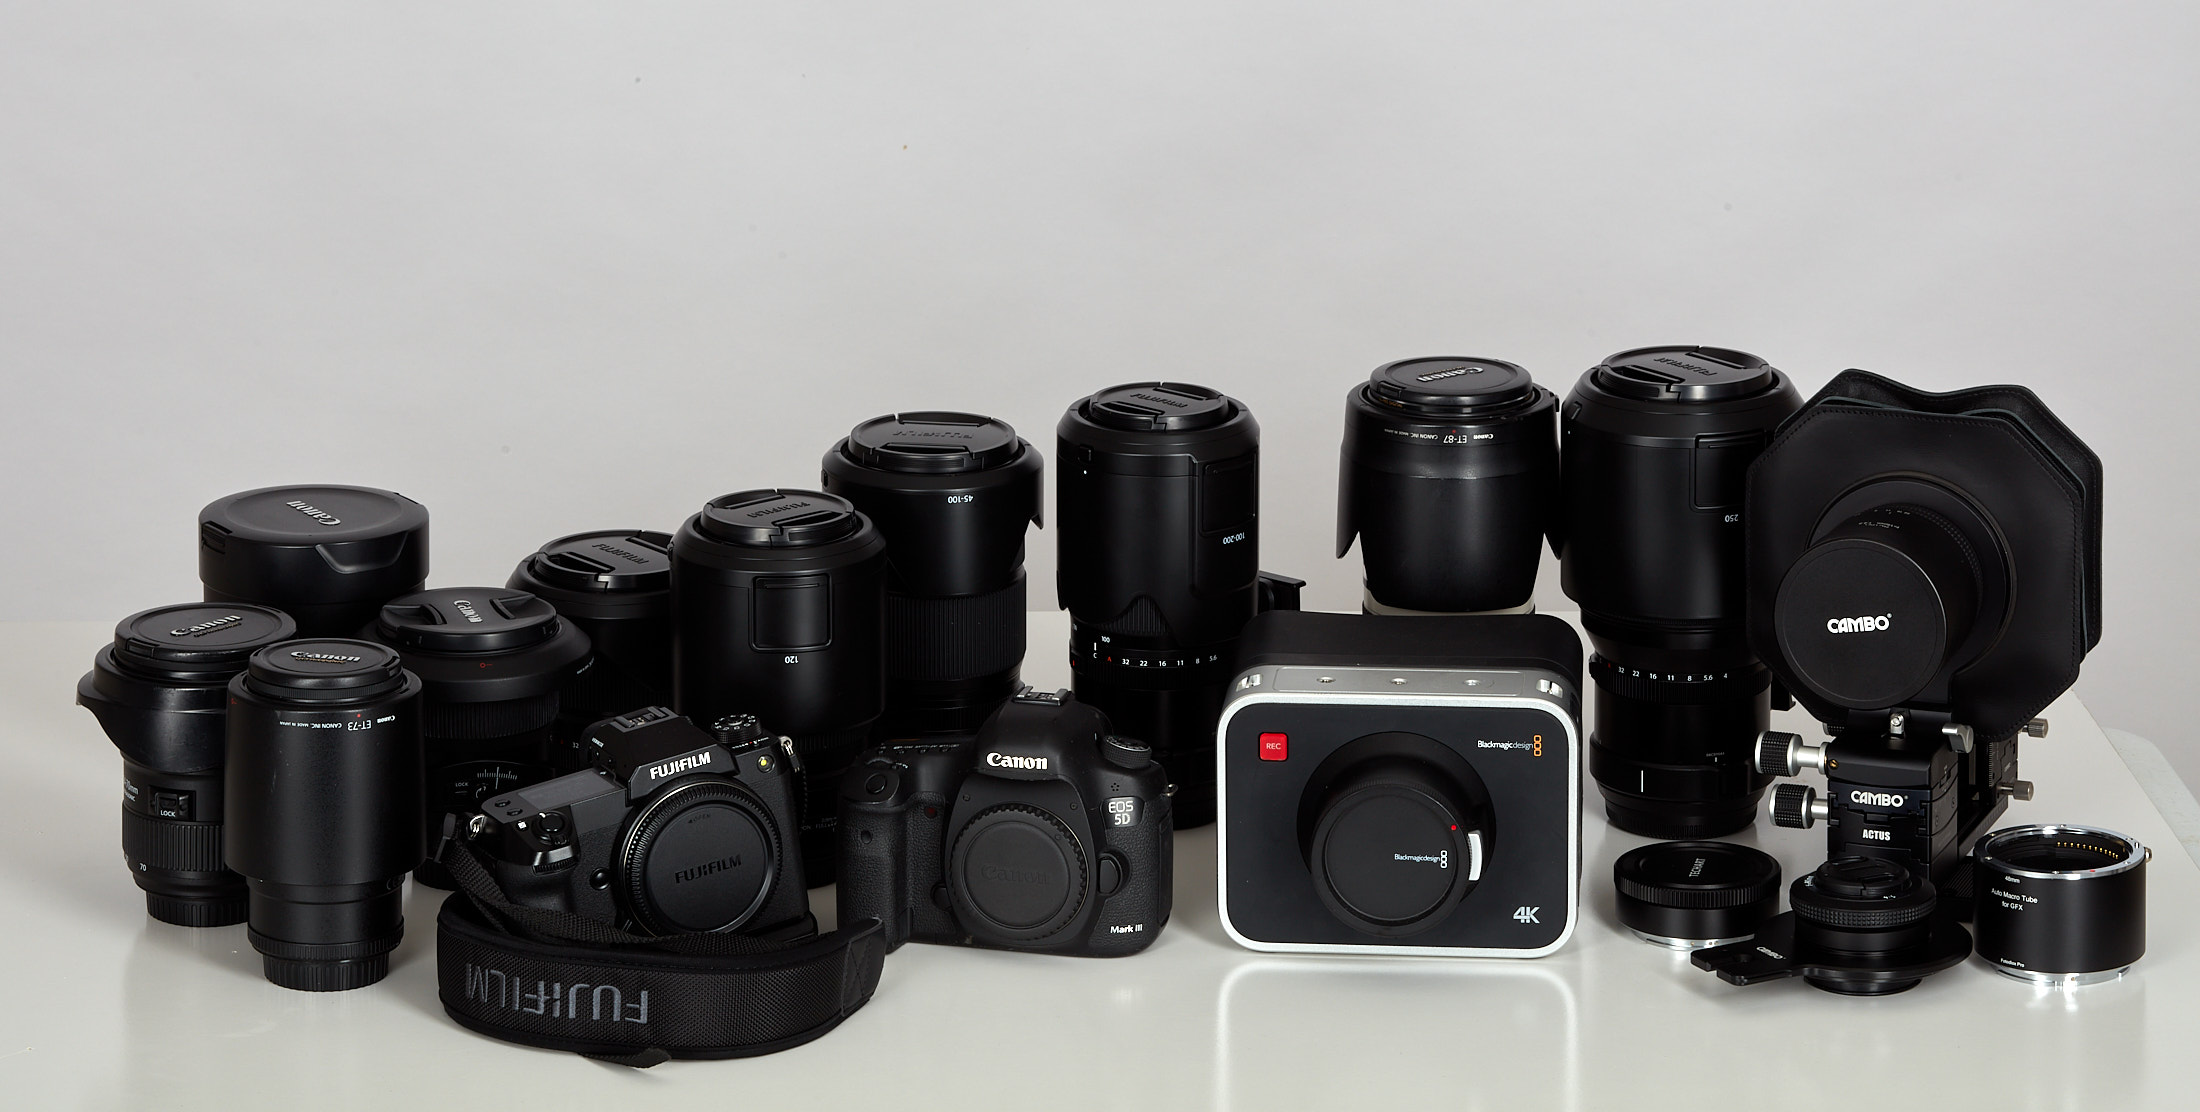 Fujifim blackmagic and Canon Lenses and cameras_Cameras and lenses